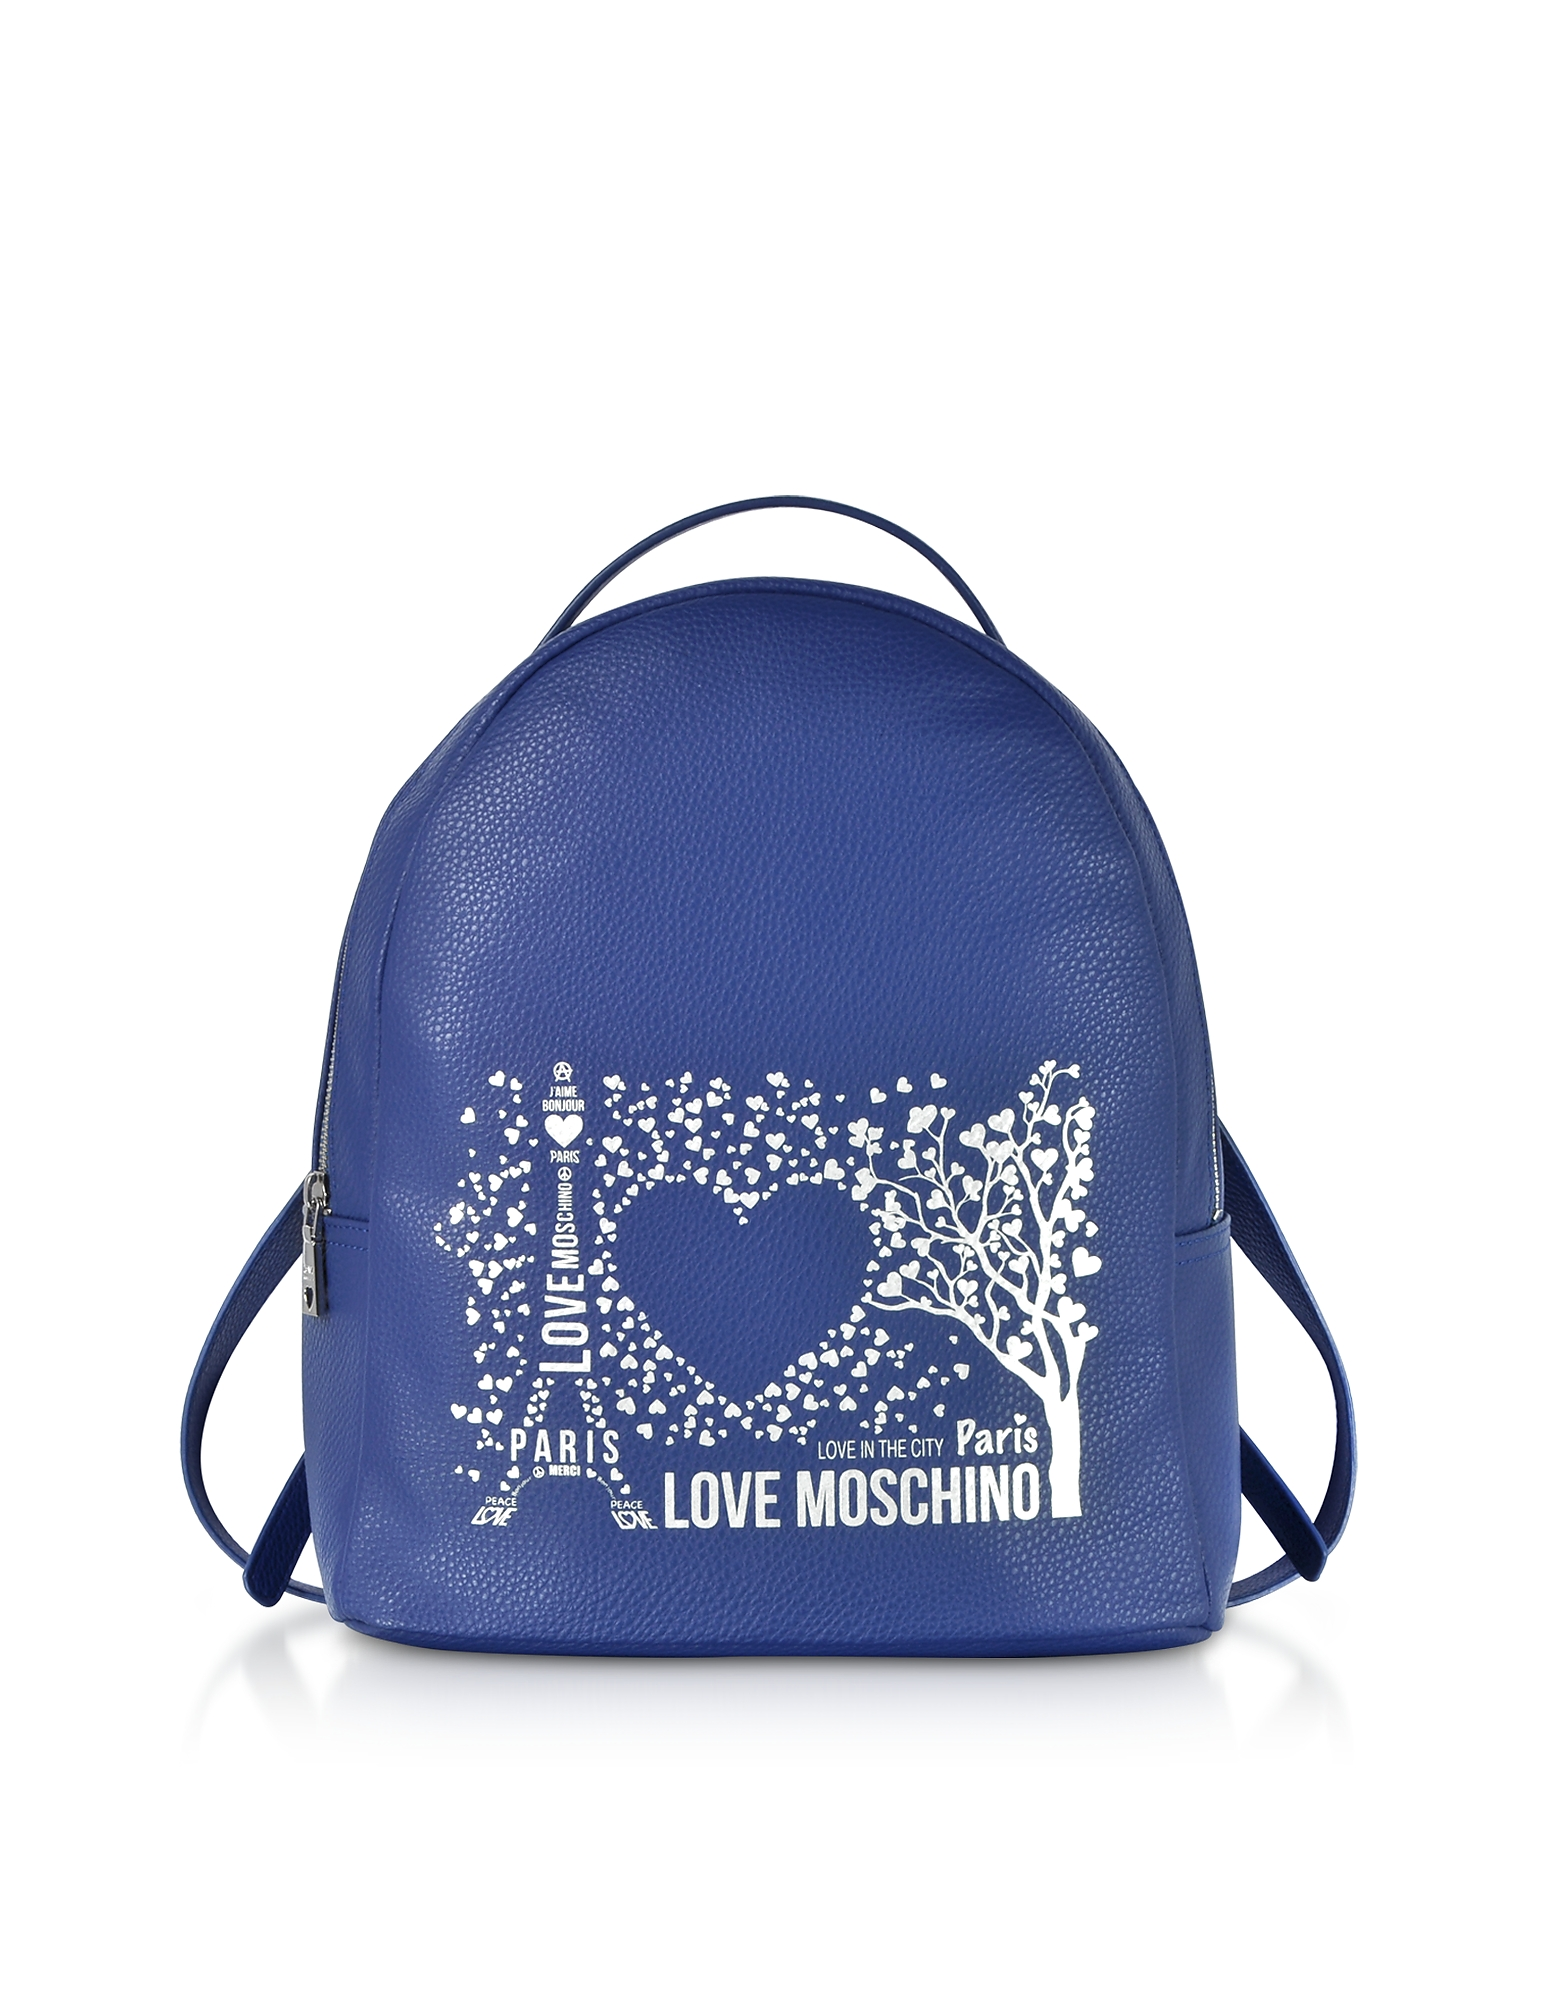 Love Moschino Handbags, Printed City Lovers Backpack